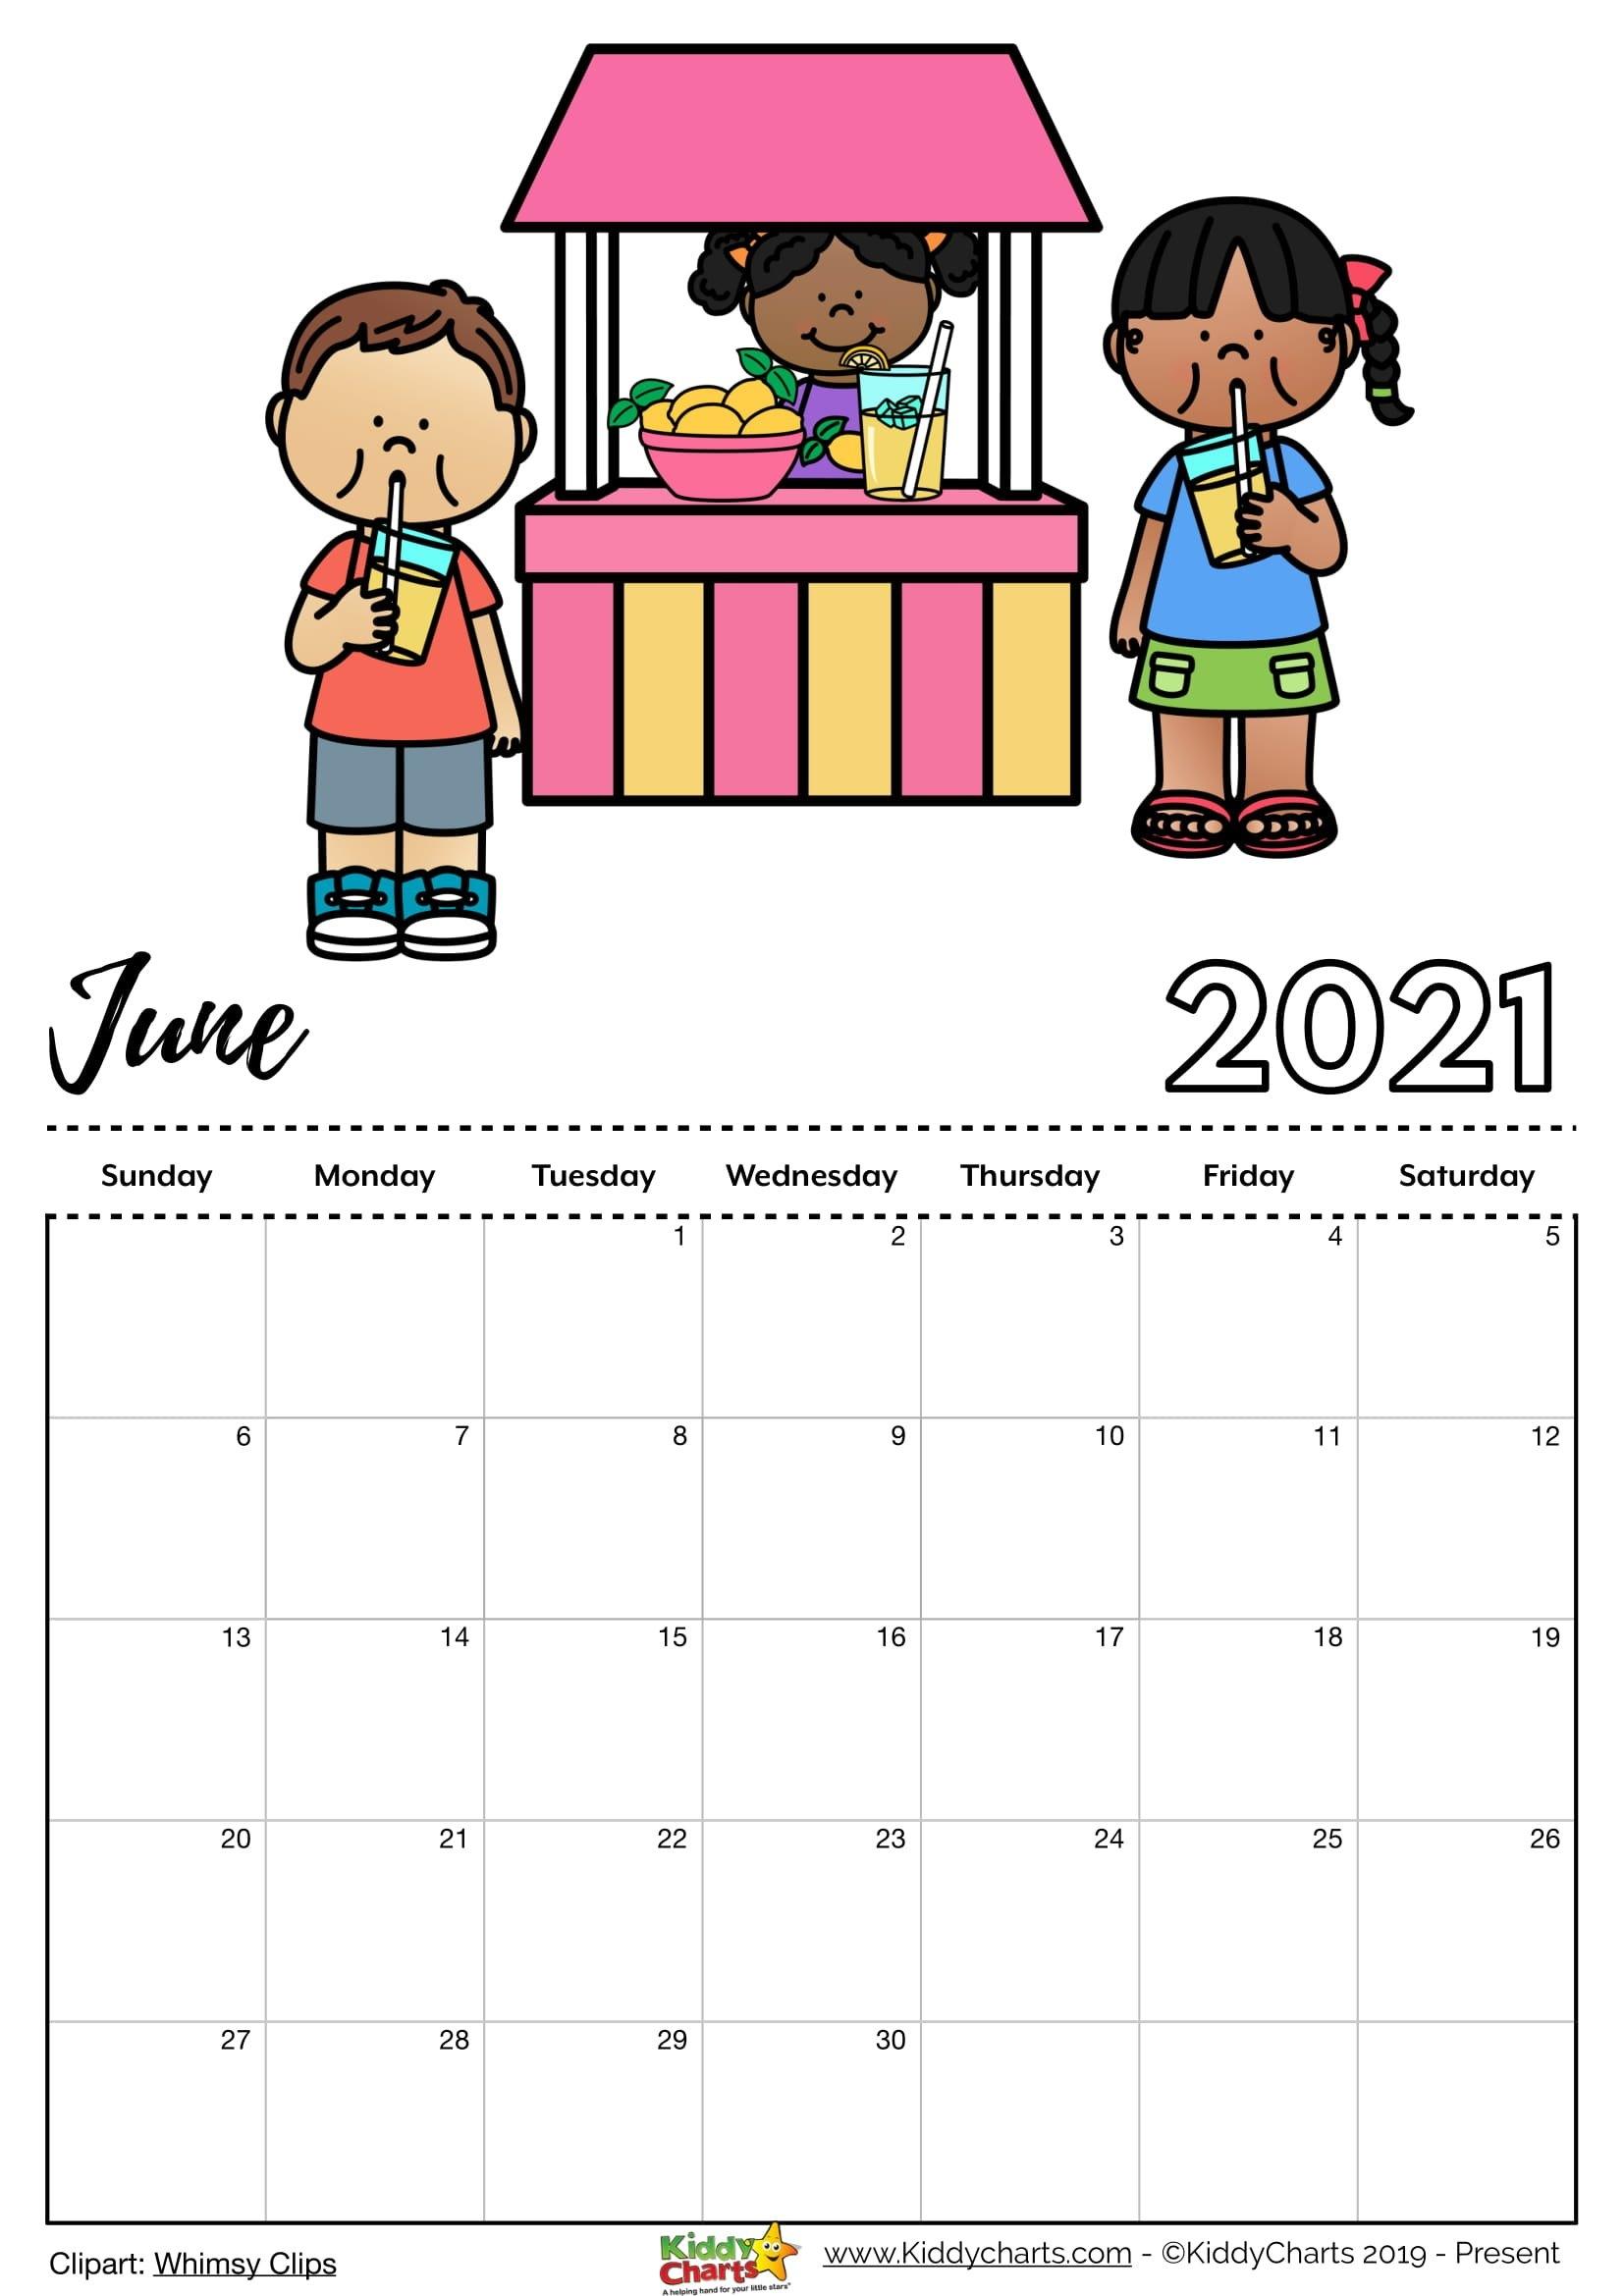 Editable 2021 Free Printable Calendar 2021 / Free Editable Printable Calendar 2021 - Template No with Calendar 2021 Ziua Up Photo